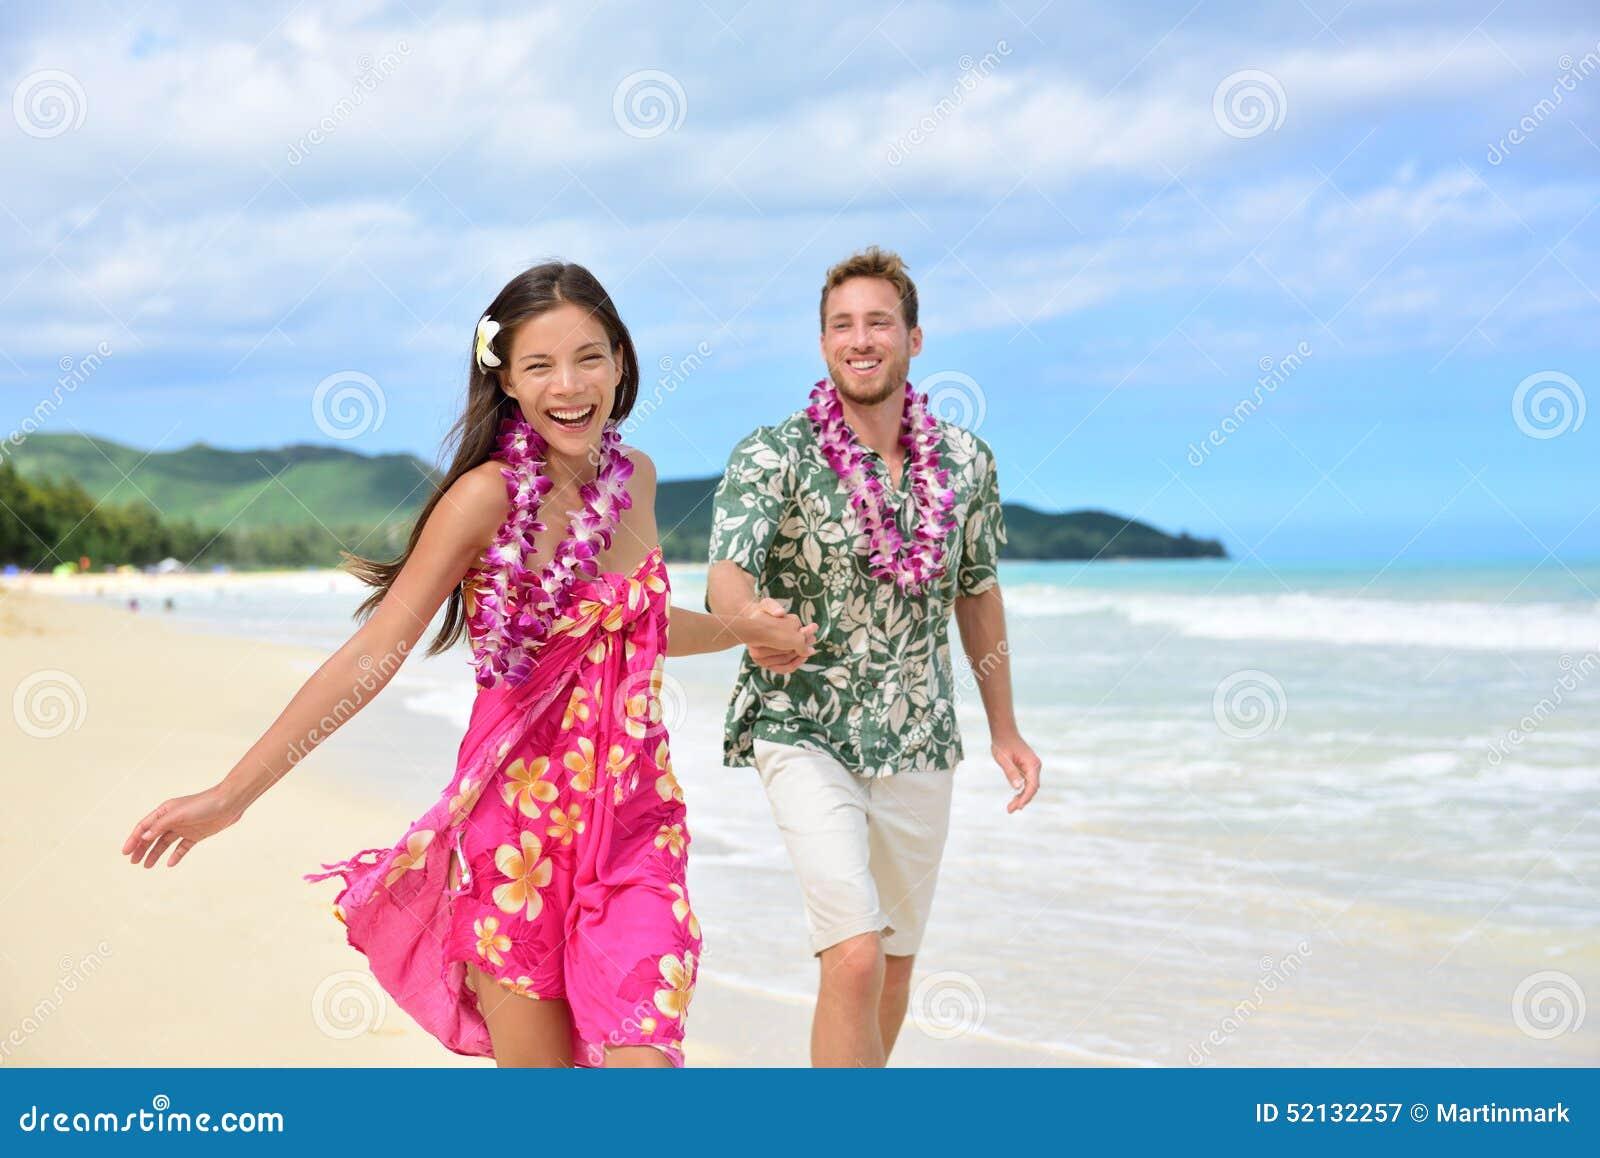 Fun Couple On Beach Vacations In Hawaiian Clothing Stock